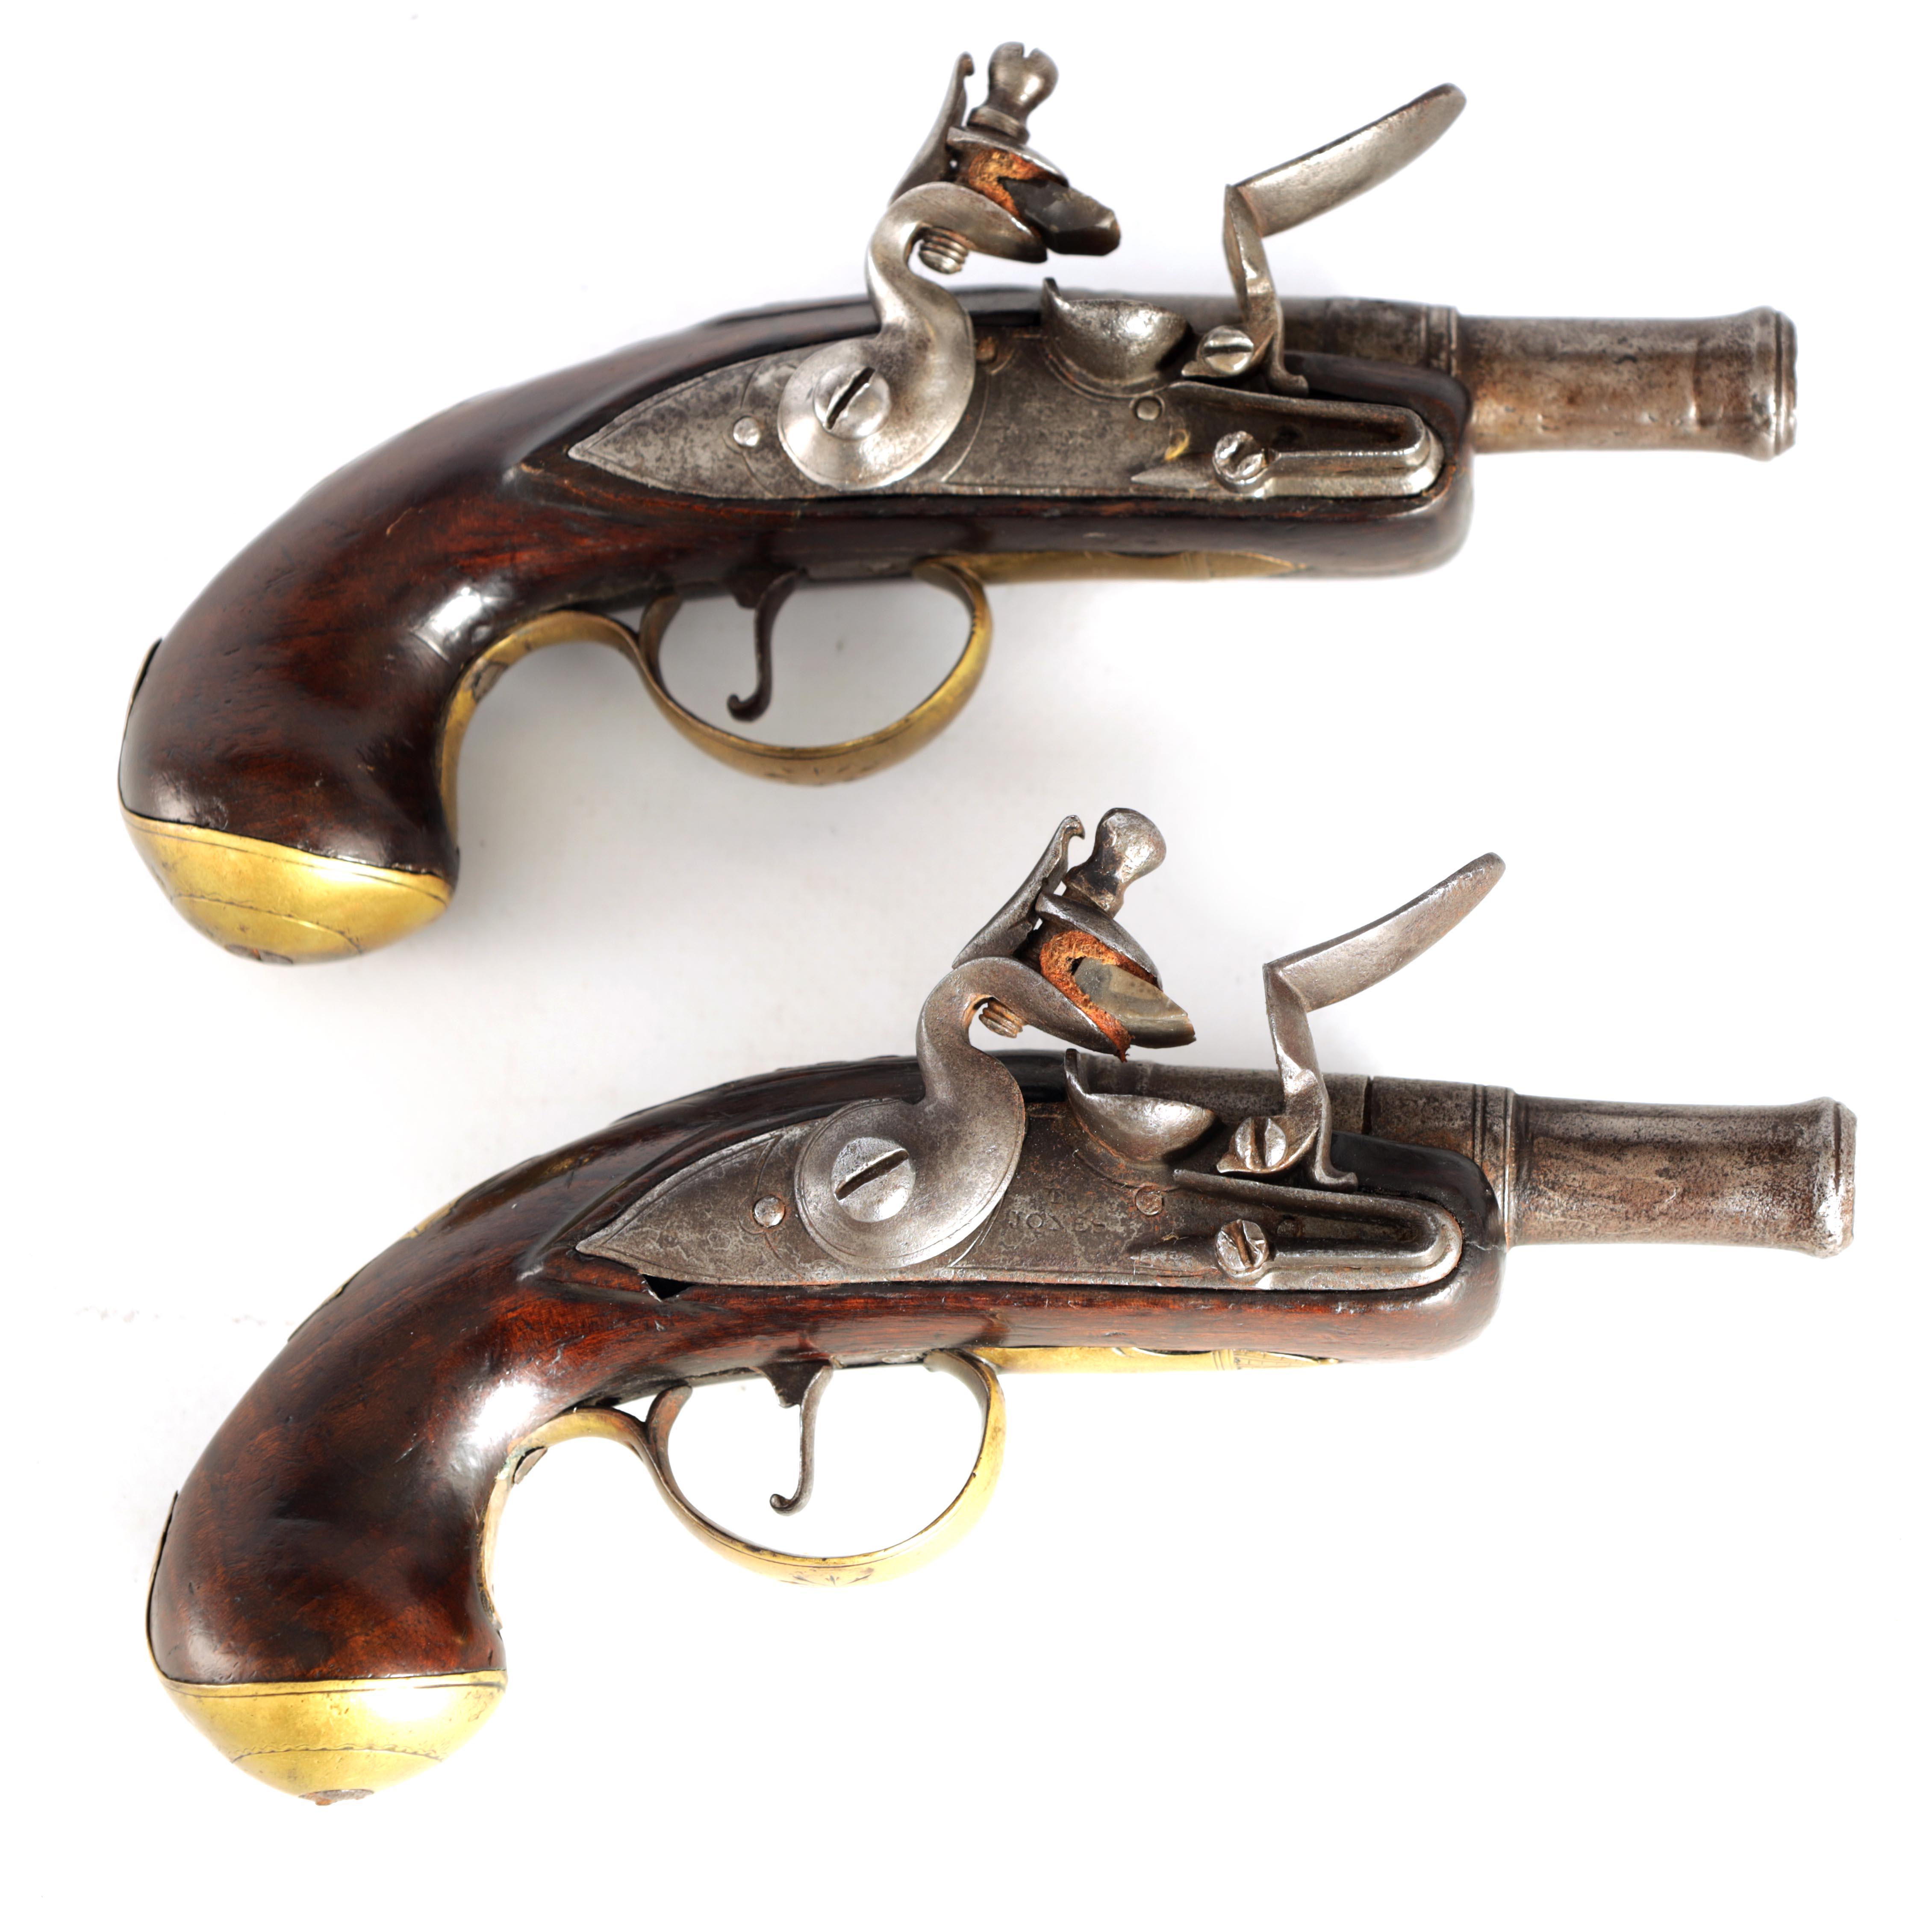 T. JONES. A PAIR OF EARLY 18TH CENTURY FLINTLOCK POCKET PISTOLS with turn-off cannon barrel,